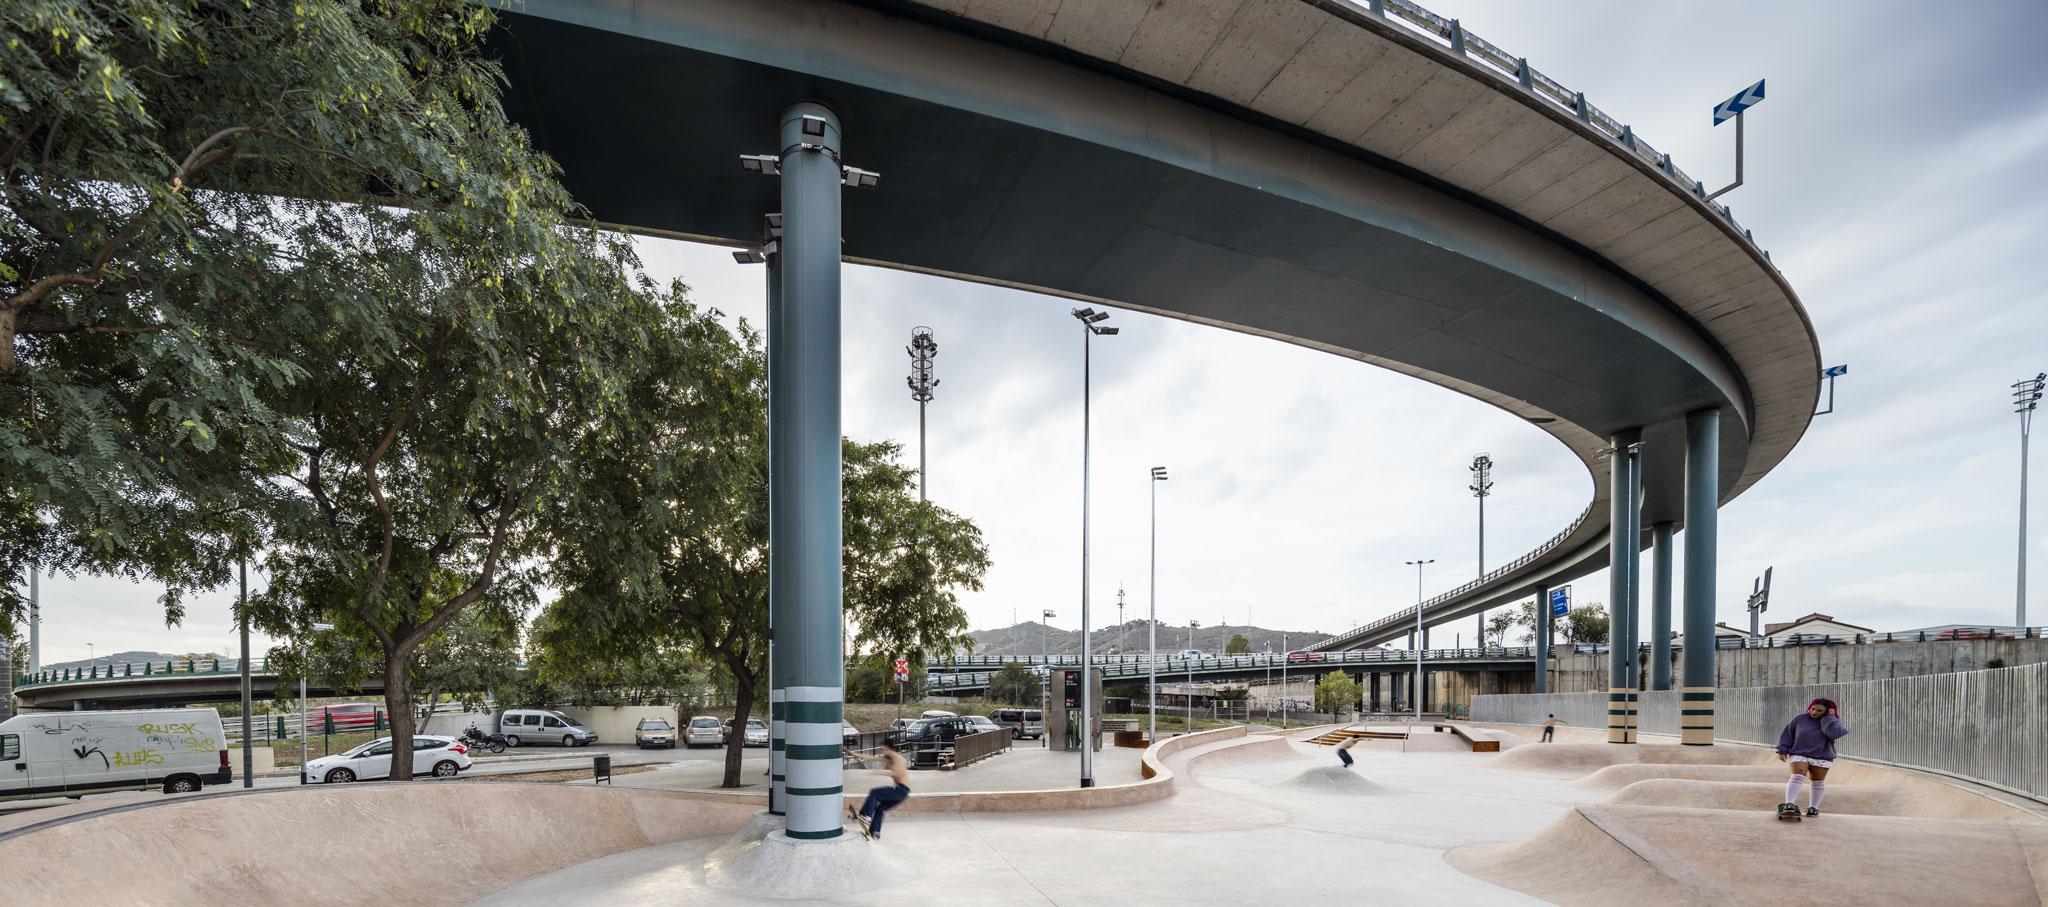 SCOB: Skate Park en Baró de Viver, Barcelona. Fotografía por ®Adria_Goula